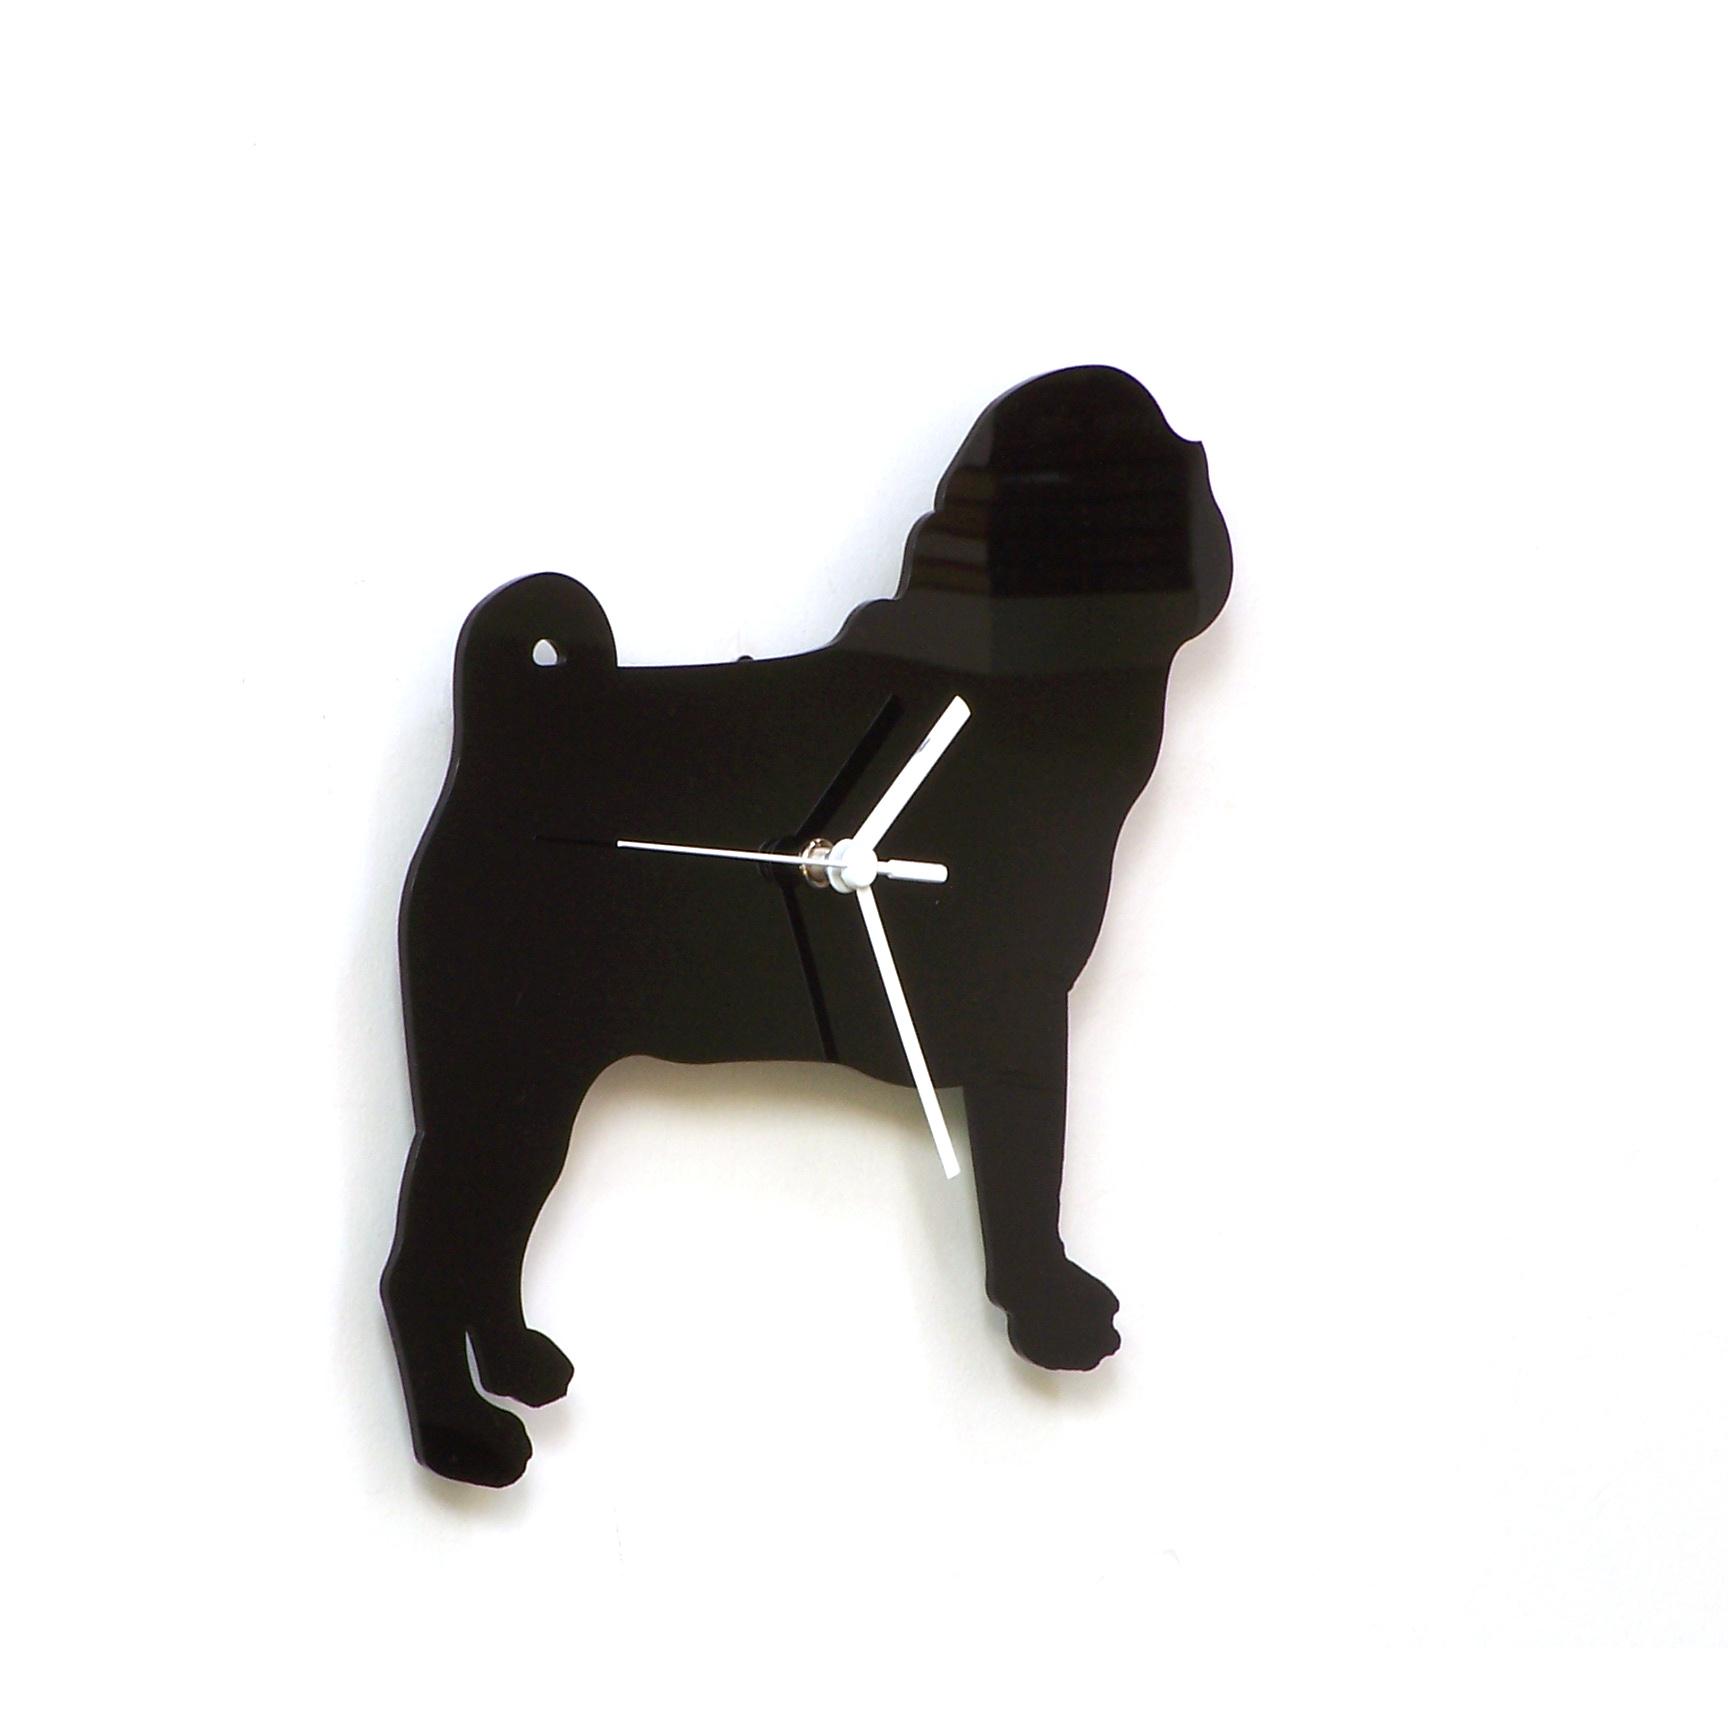 Animal Wall Art pug dog - black acrylic wall clock, a piece of wall art, animal